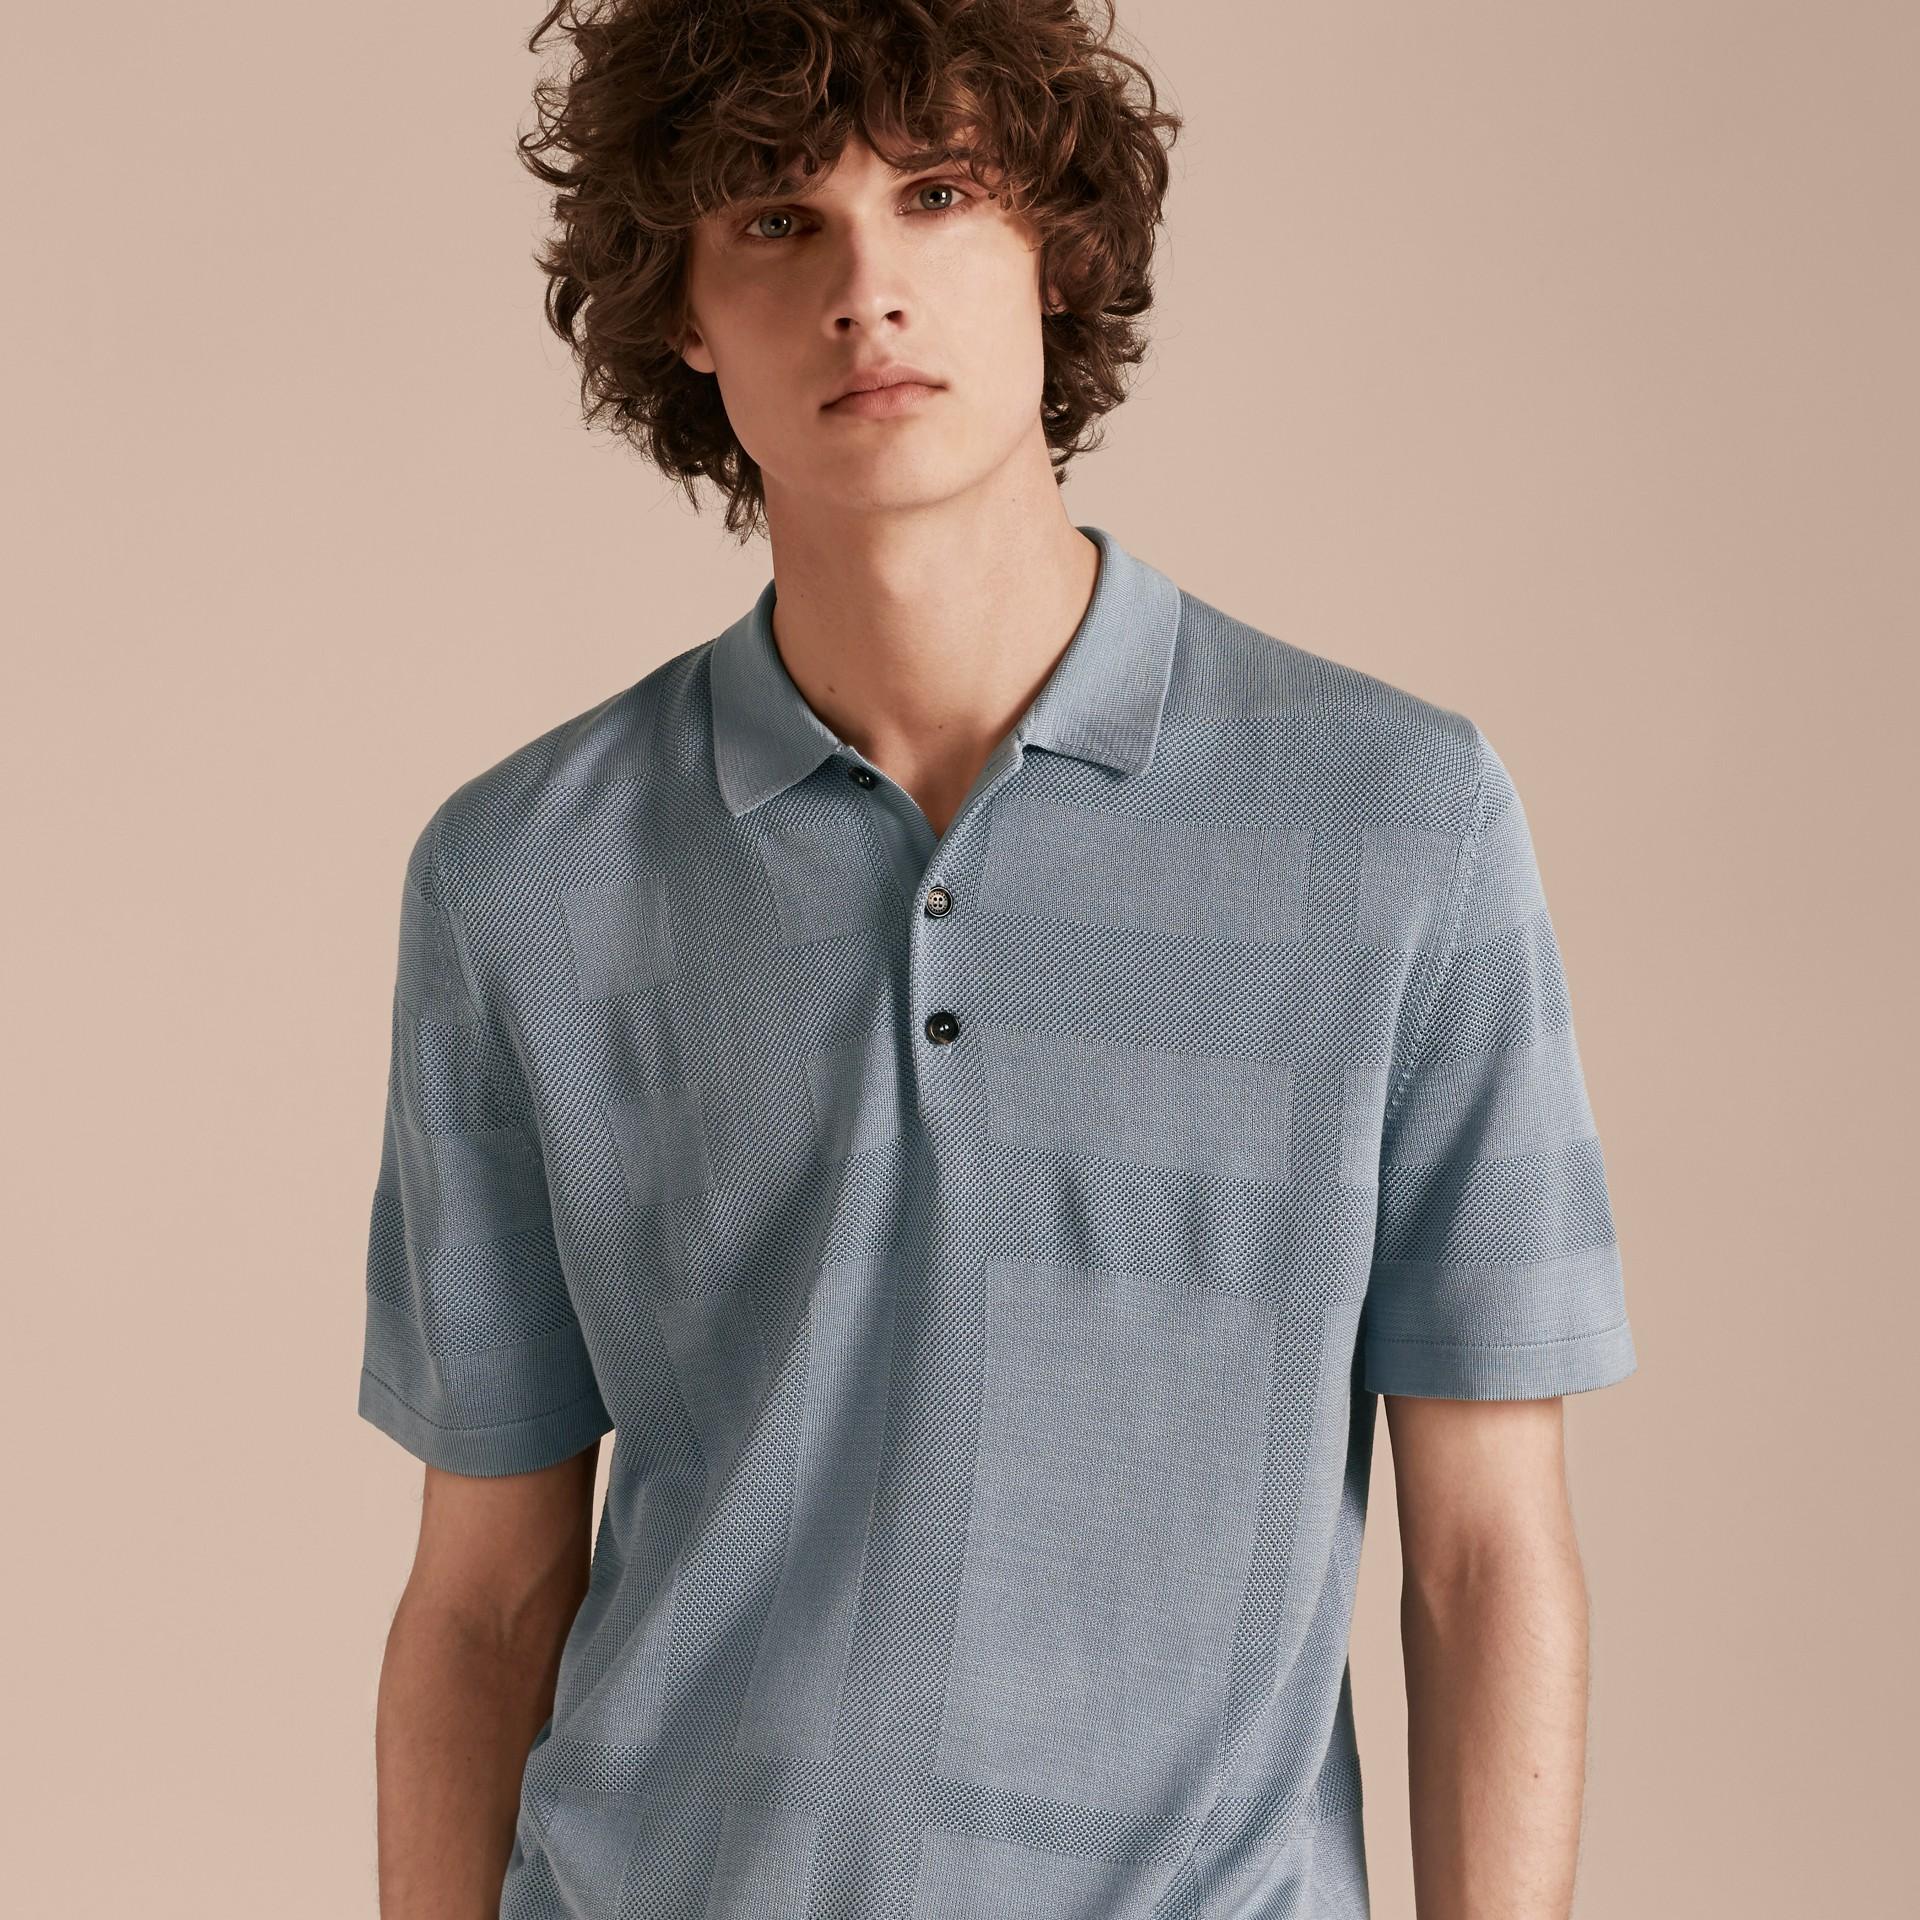 Check Jacquard Piqué Silk Cotton Polo Shirt in Slate Blue - Men | Burberry Australia - gallery image 6